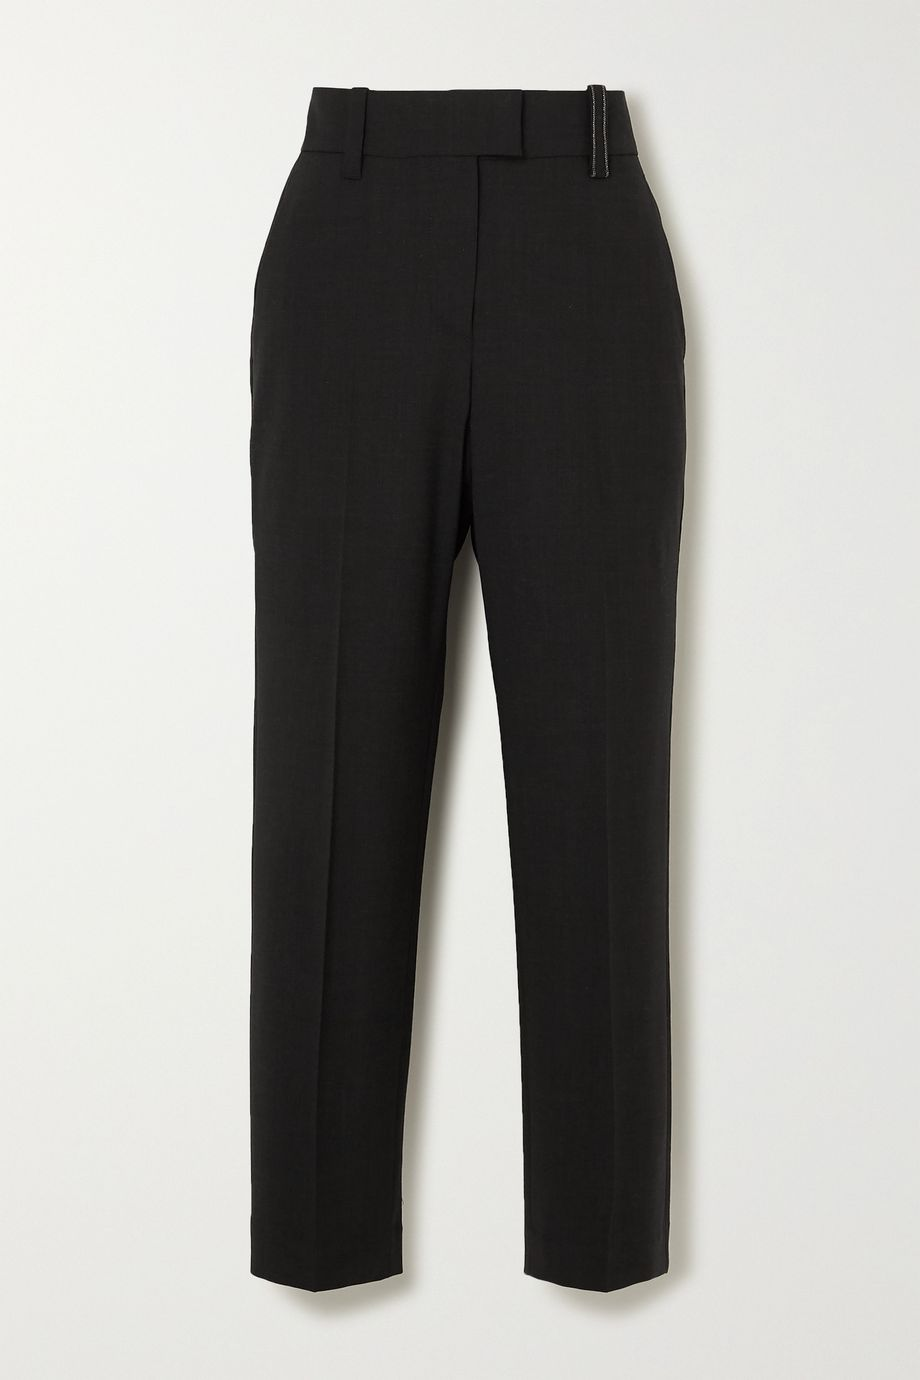 Brunello Cucinelli Embellished wool-blend tapered pants